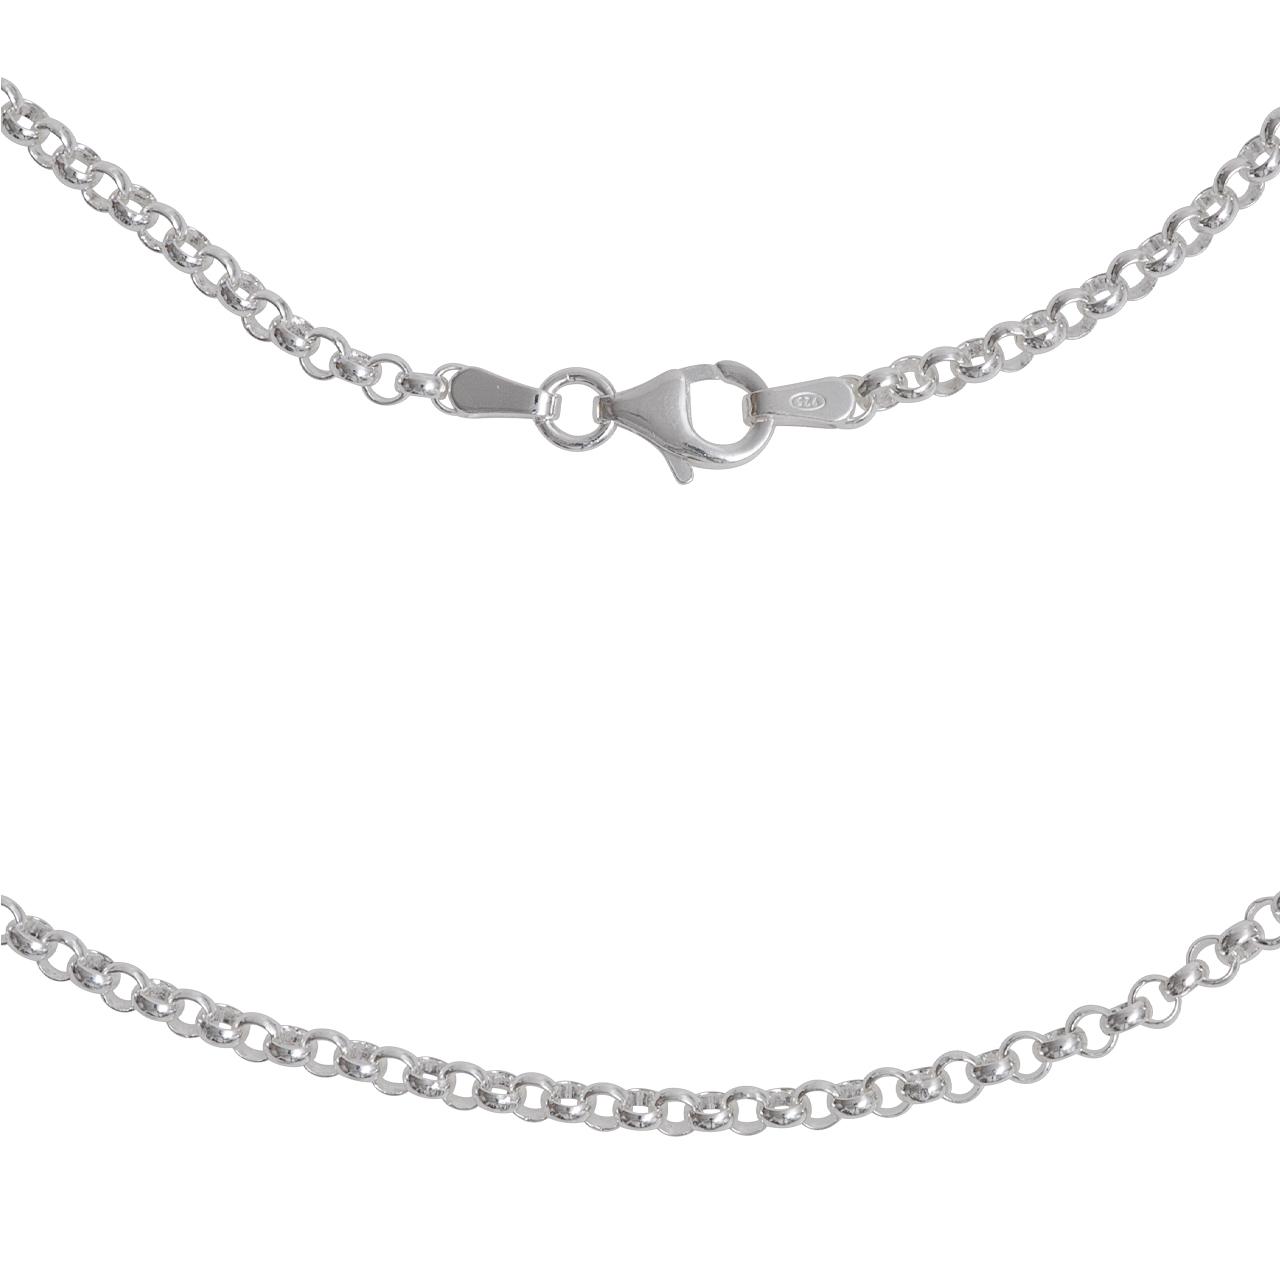 Silber-Kette, 80cm